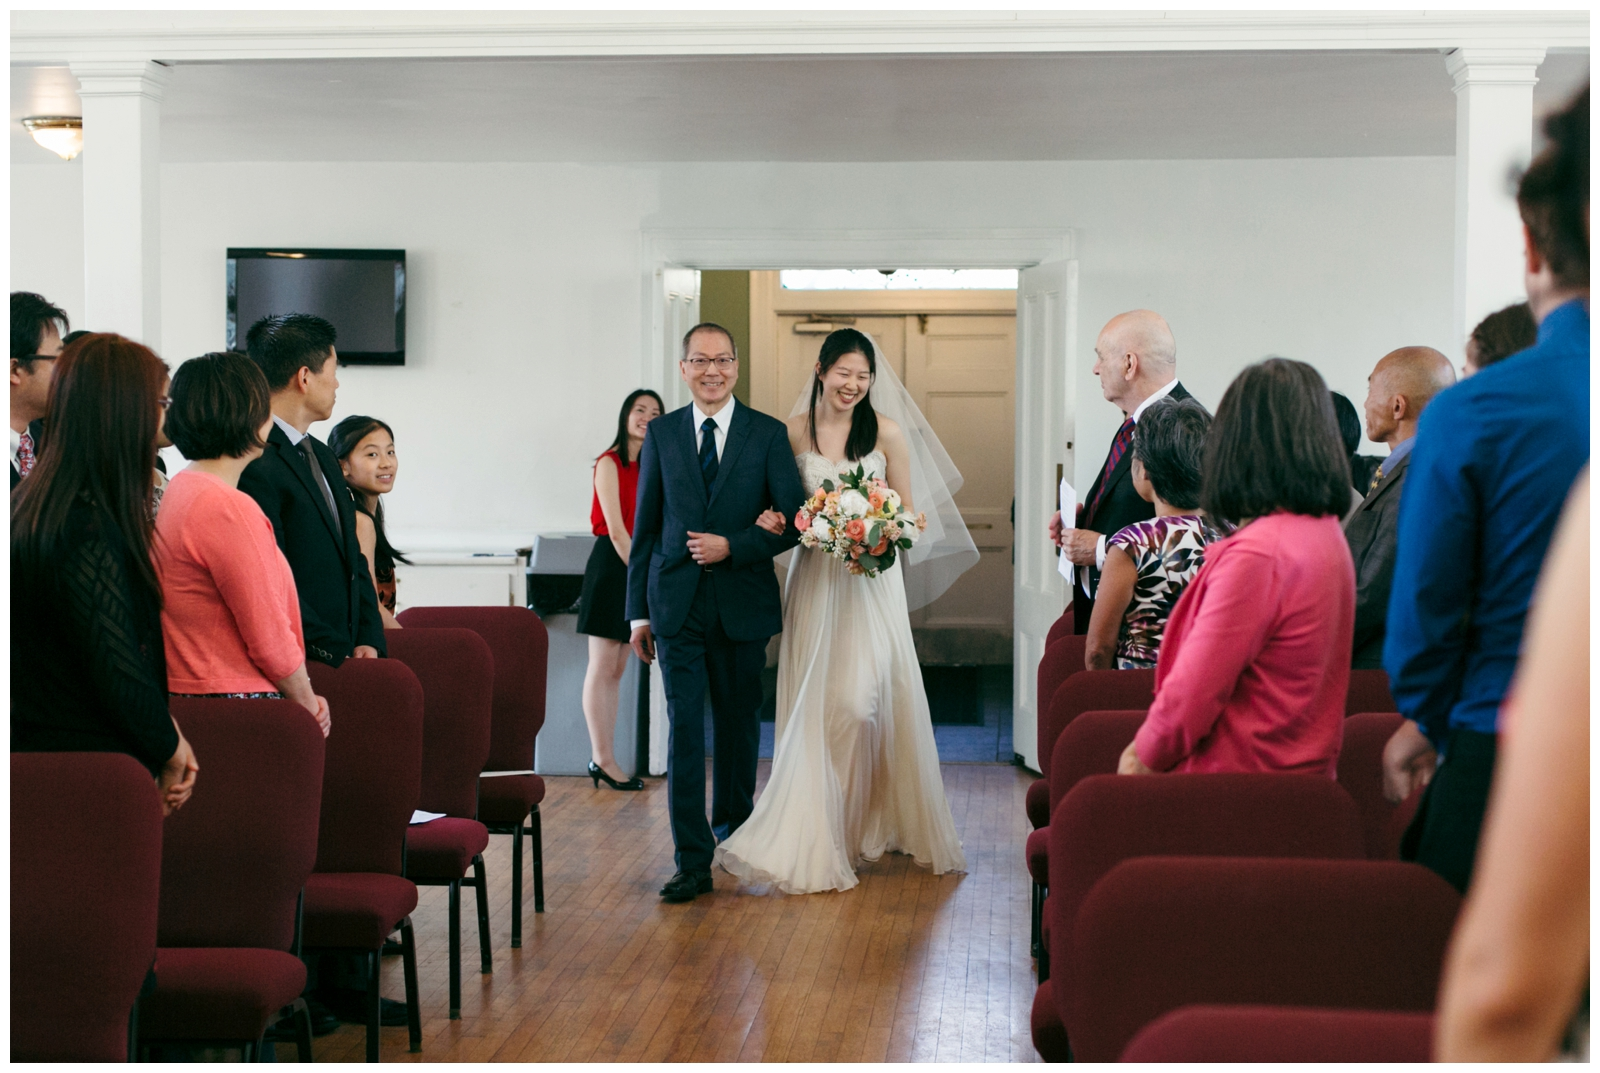 Samberg-Conference-Center-Boston-Wedding-Photographer-Bailey-Q-Photo-044.jpg